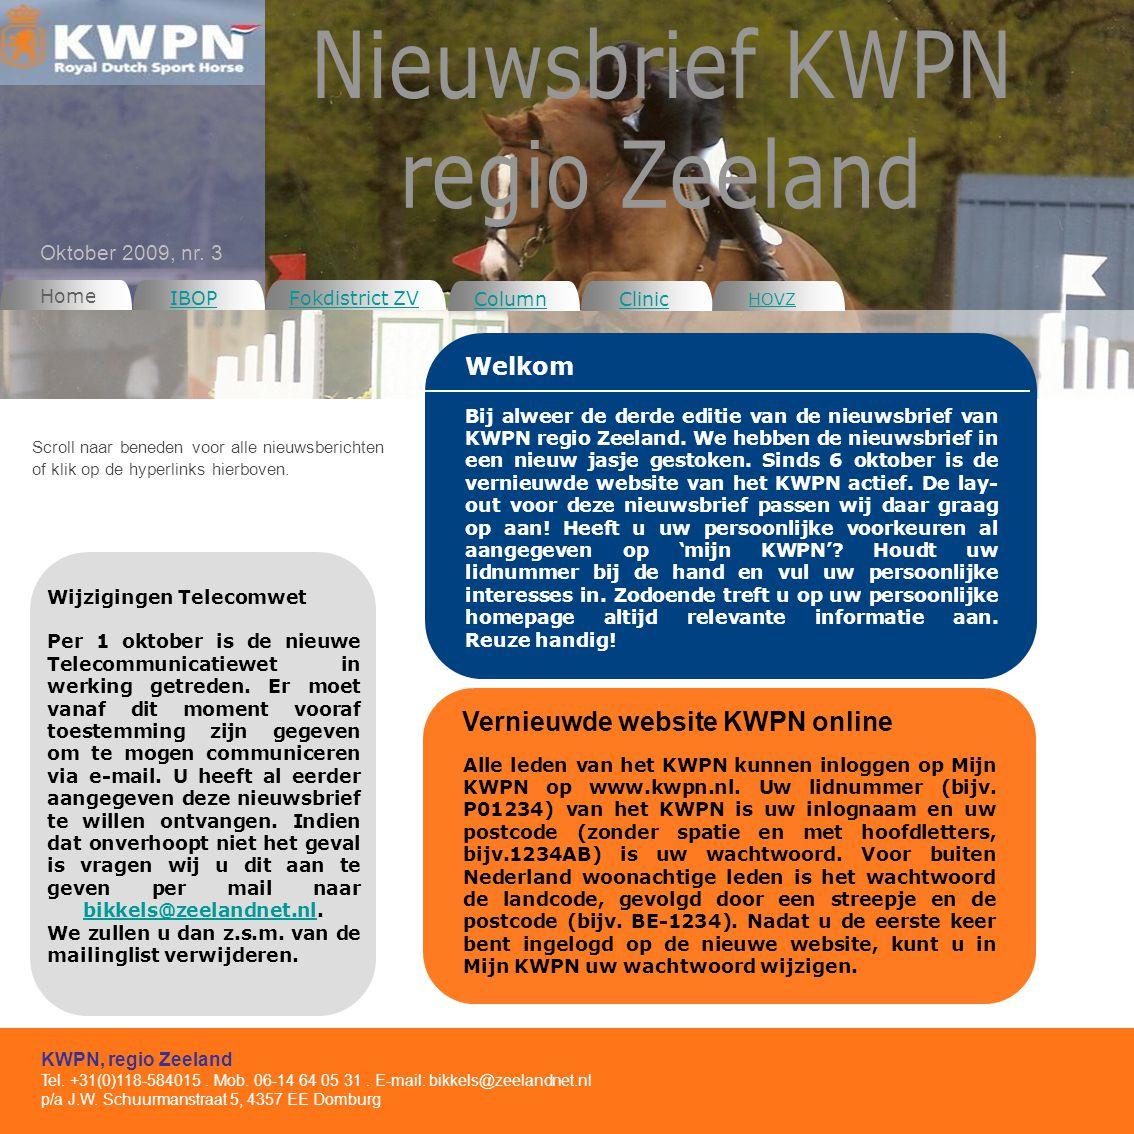 Home IBOP Column Clinic Welkom KWPN, regio Zeeland Tel.